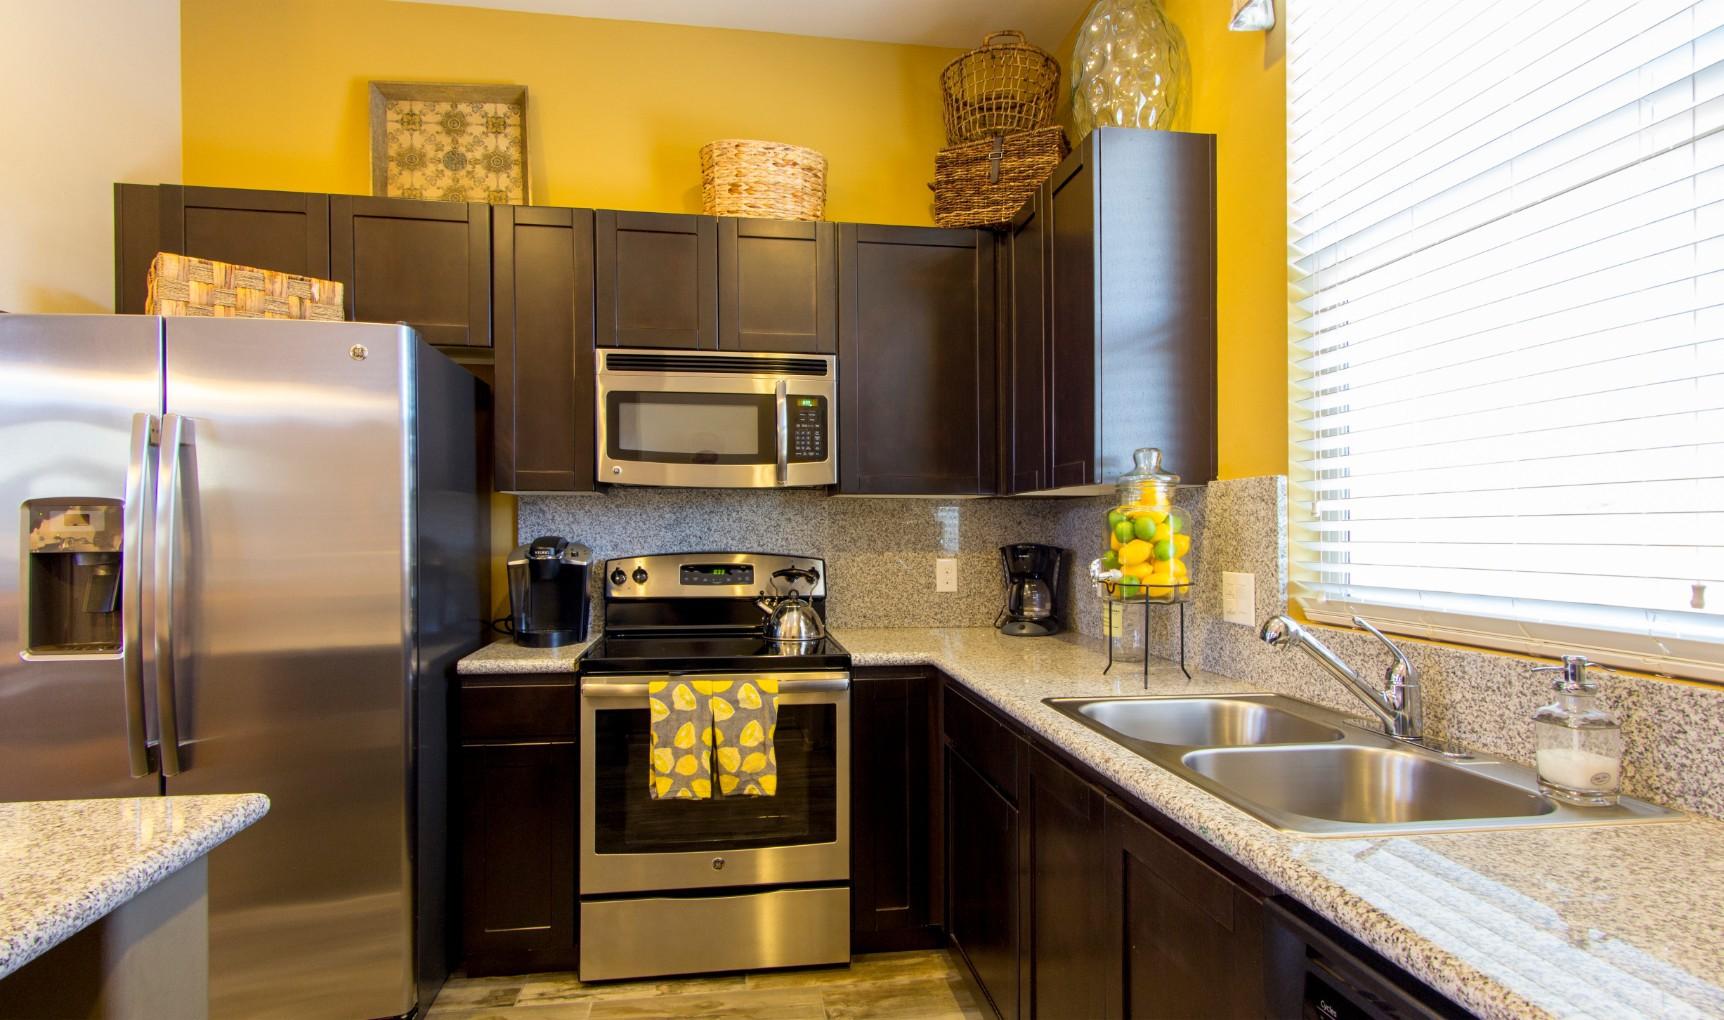 Apartments Near Tucson Sabino Vista Apartment Homes for Tucson Students in Tucson, AZ